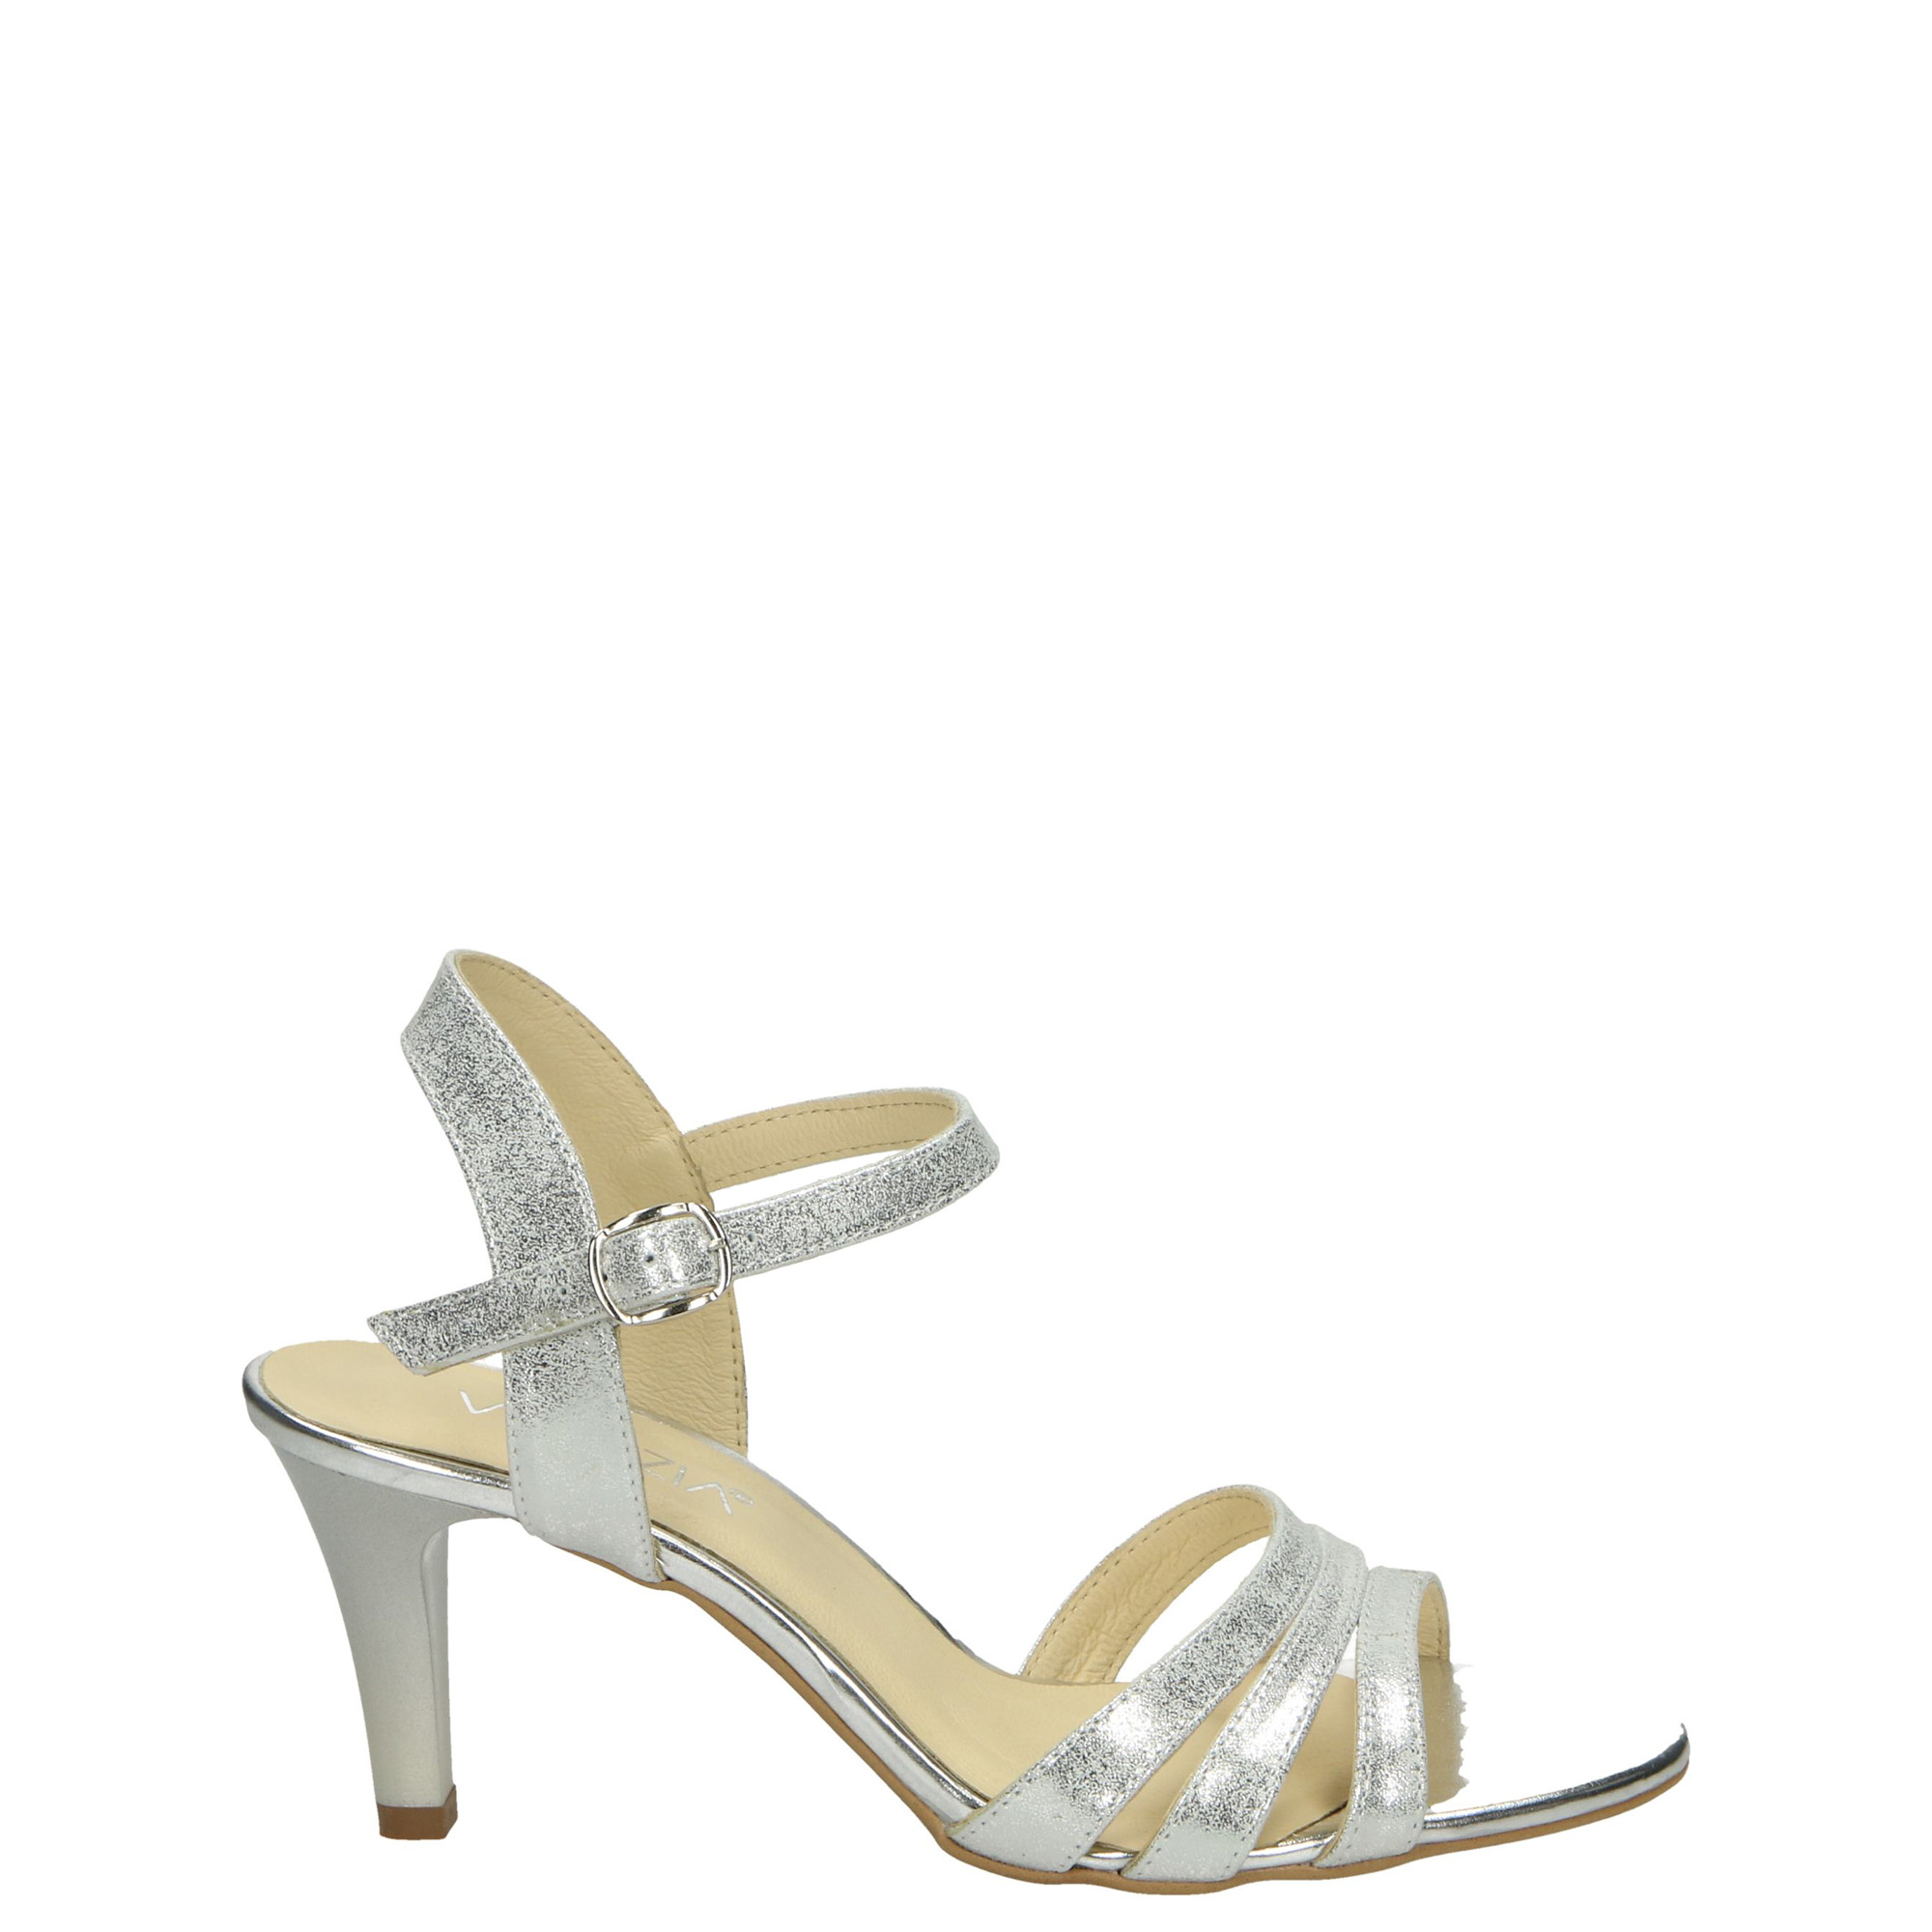 0d5c5200d30 sandały venezia srebrne sandały na obcasie - 203 argent 02 - venezia